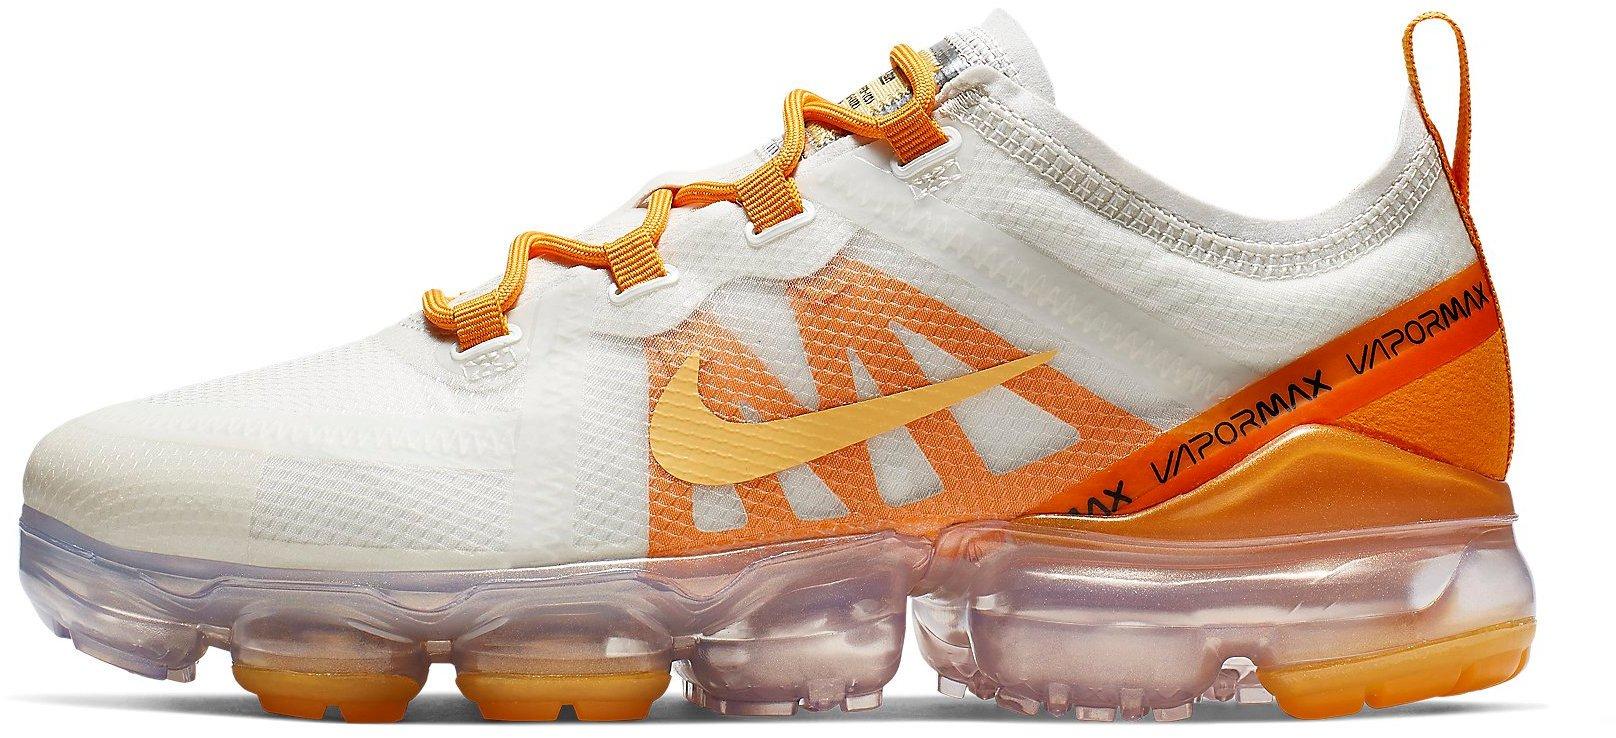 Shoes Nike WMNS AIR VAPORMAX 2019